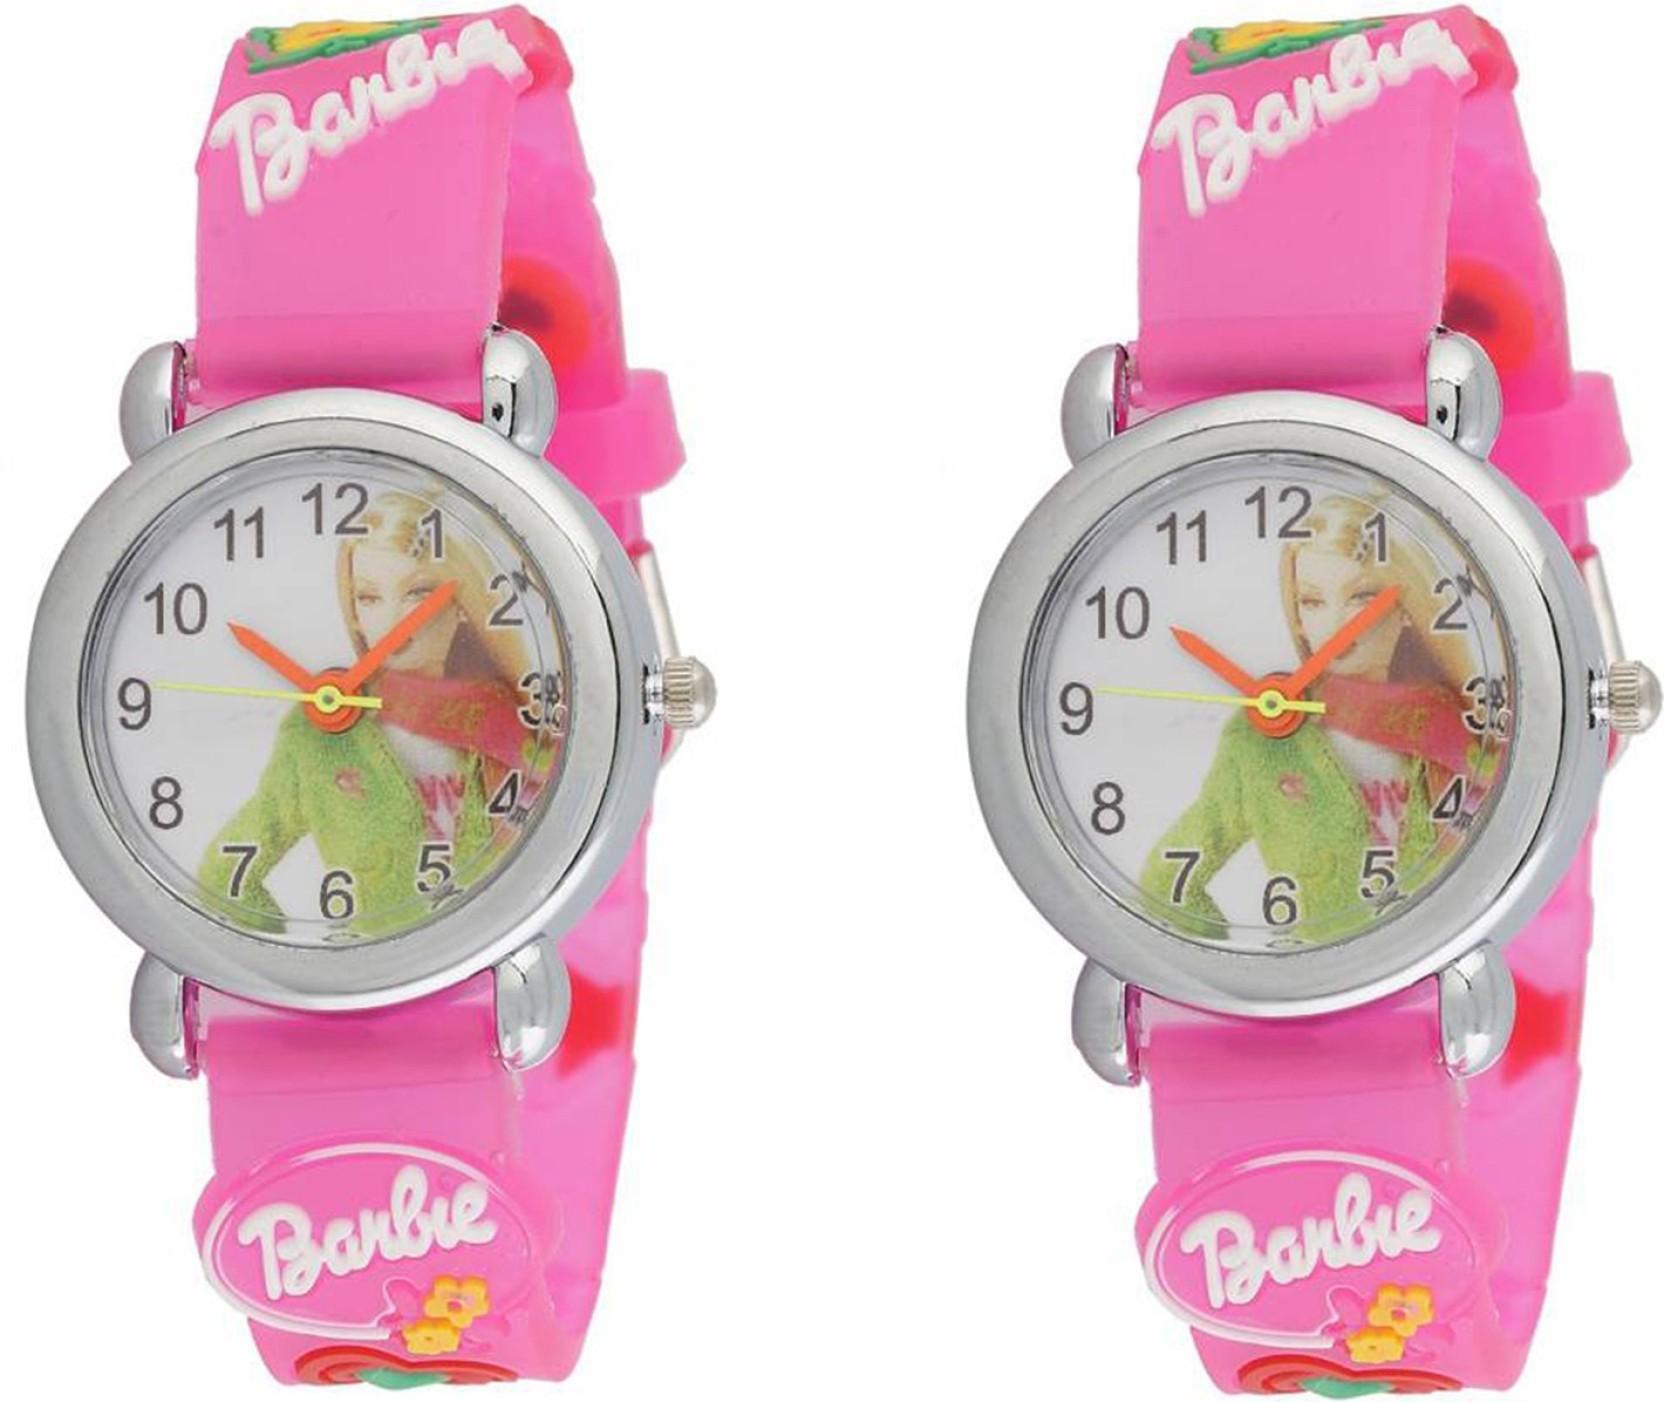 keepkart Pink Brabie Childen Watch Combo Pack Of- 2 Watch - For Boys & Girls